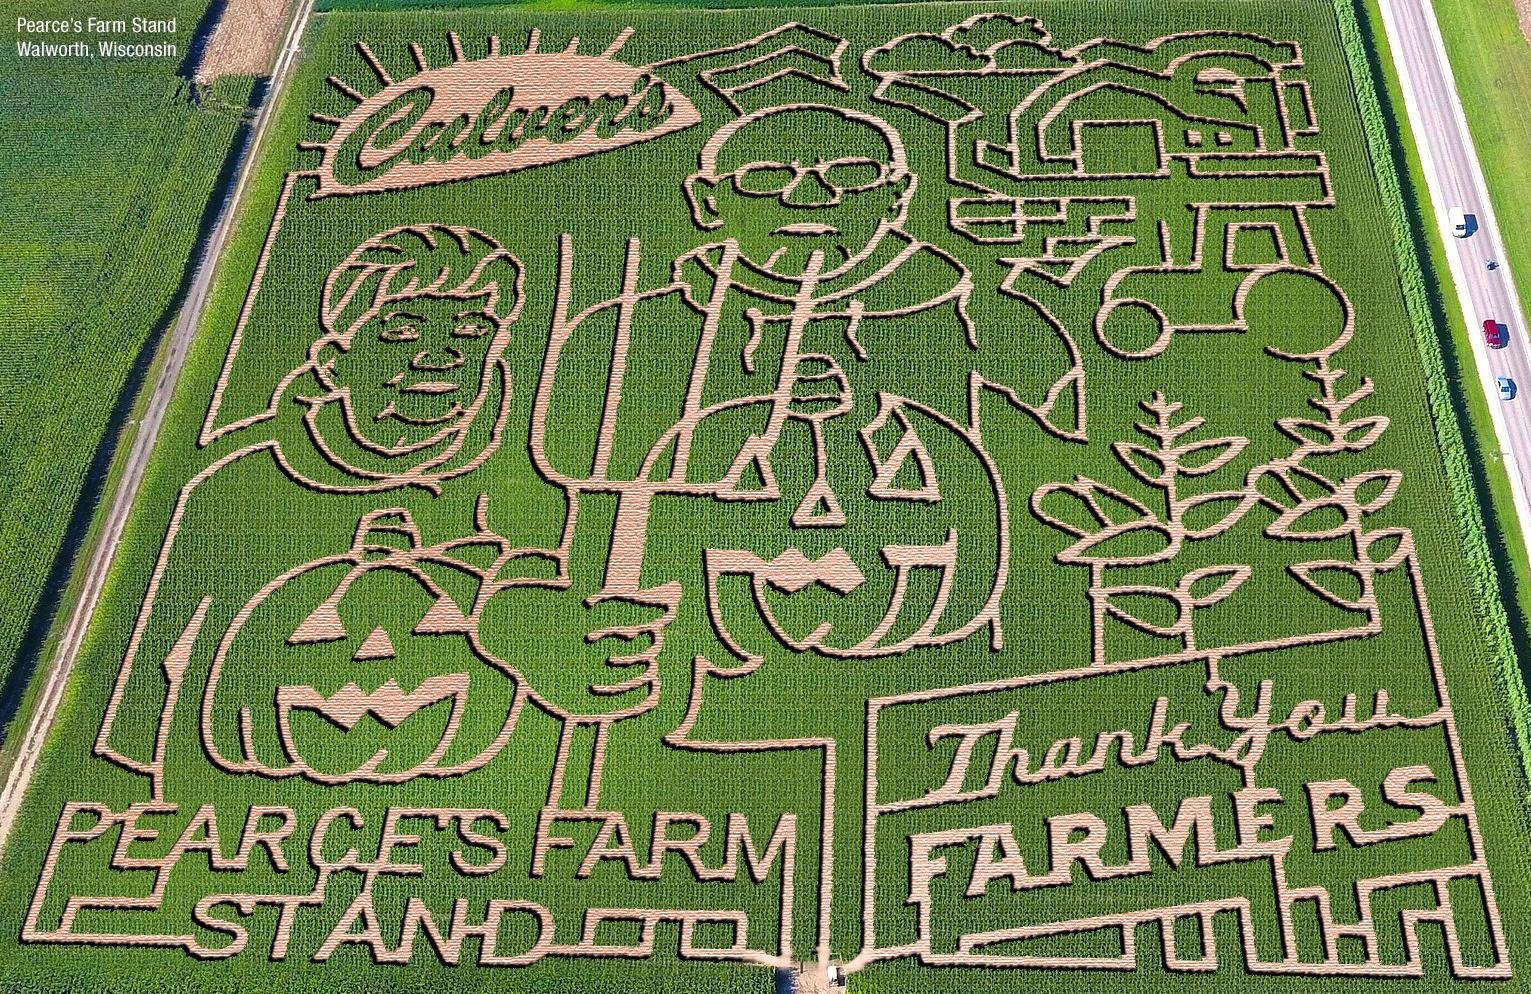 Pearce's Farm Stand